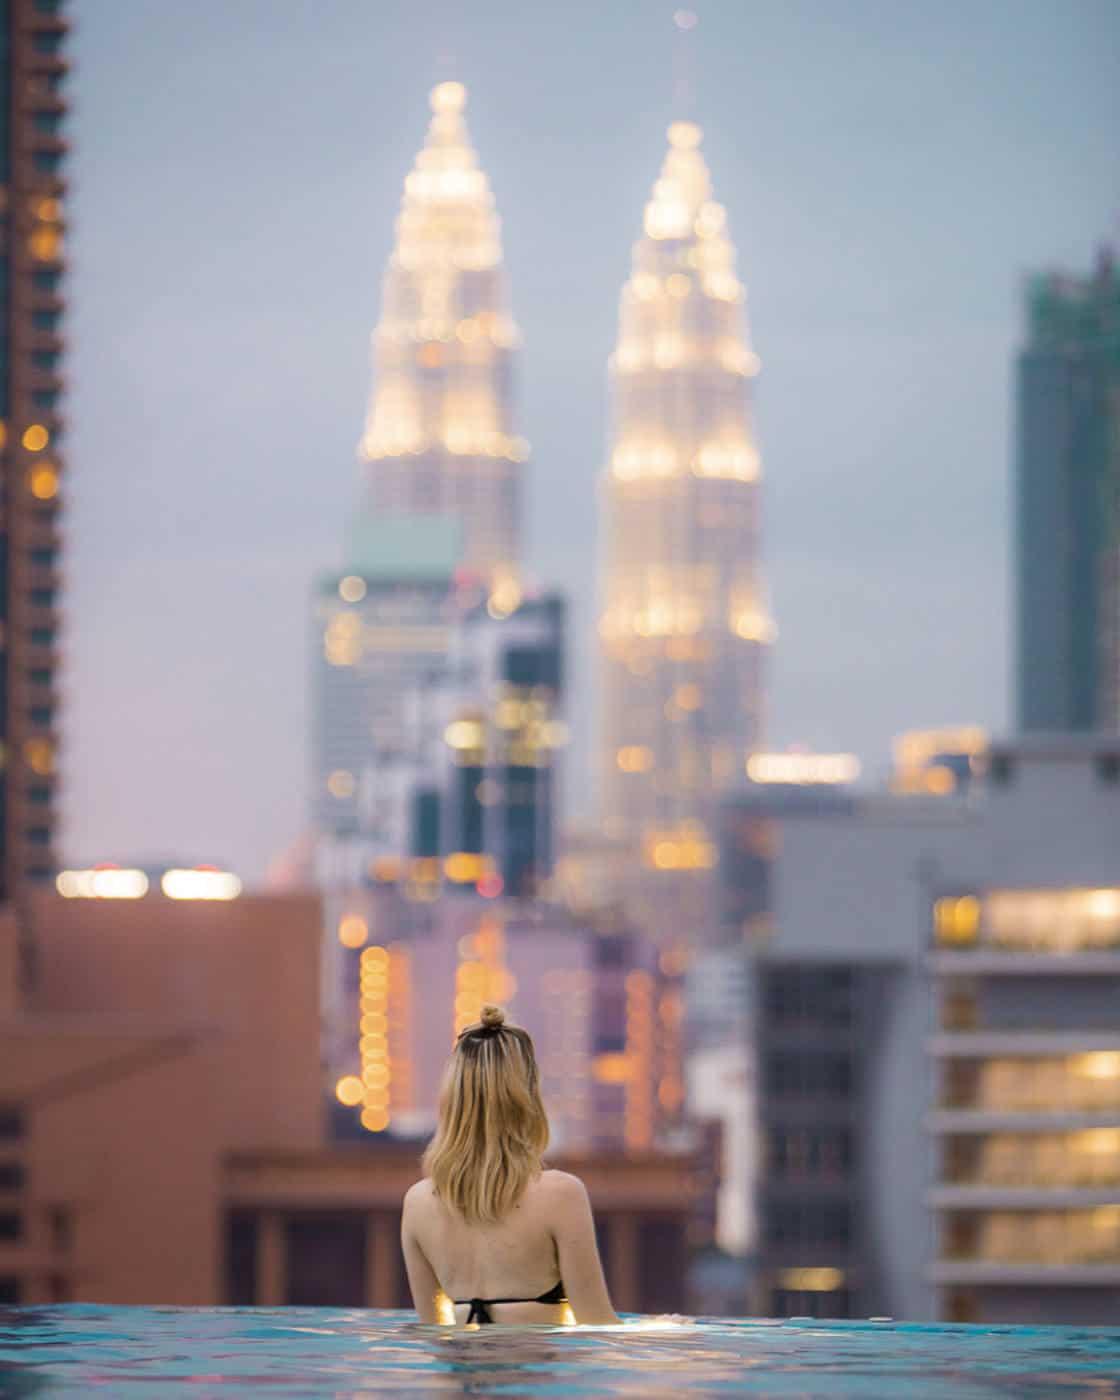 D'Majestic Hotel Kuala Lumpur infinity pool